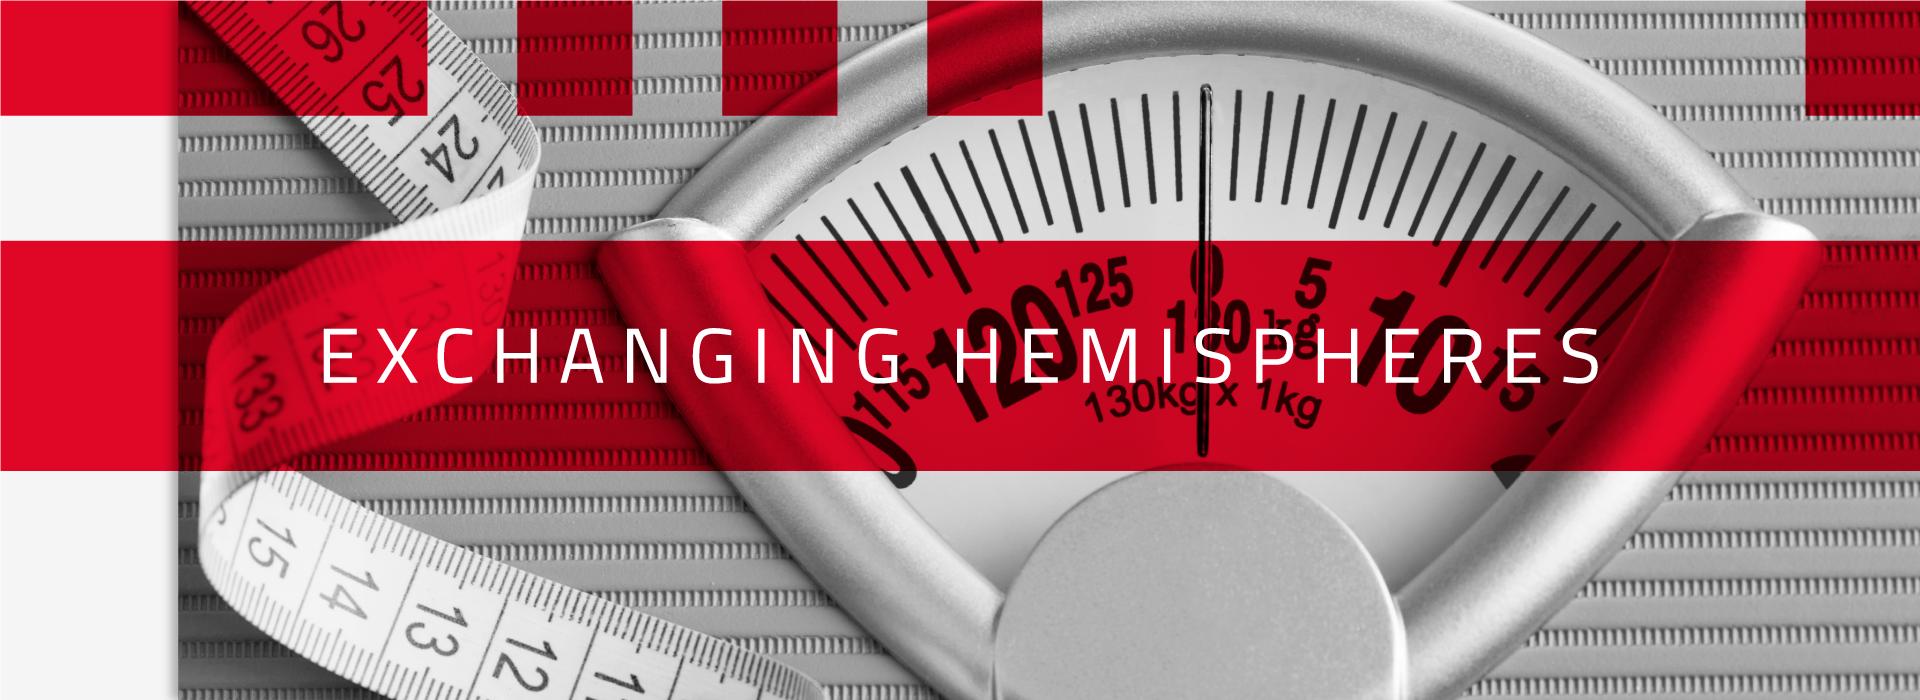 Logo do programa Exchanging Hemispheres